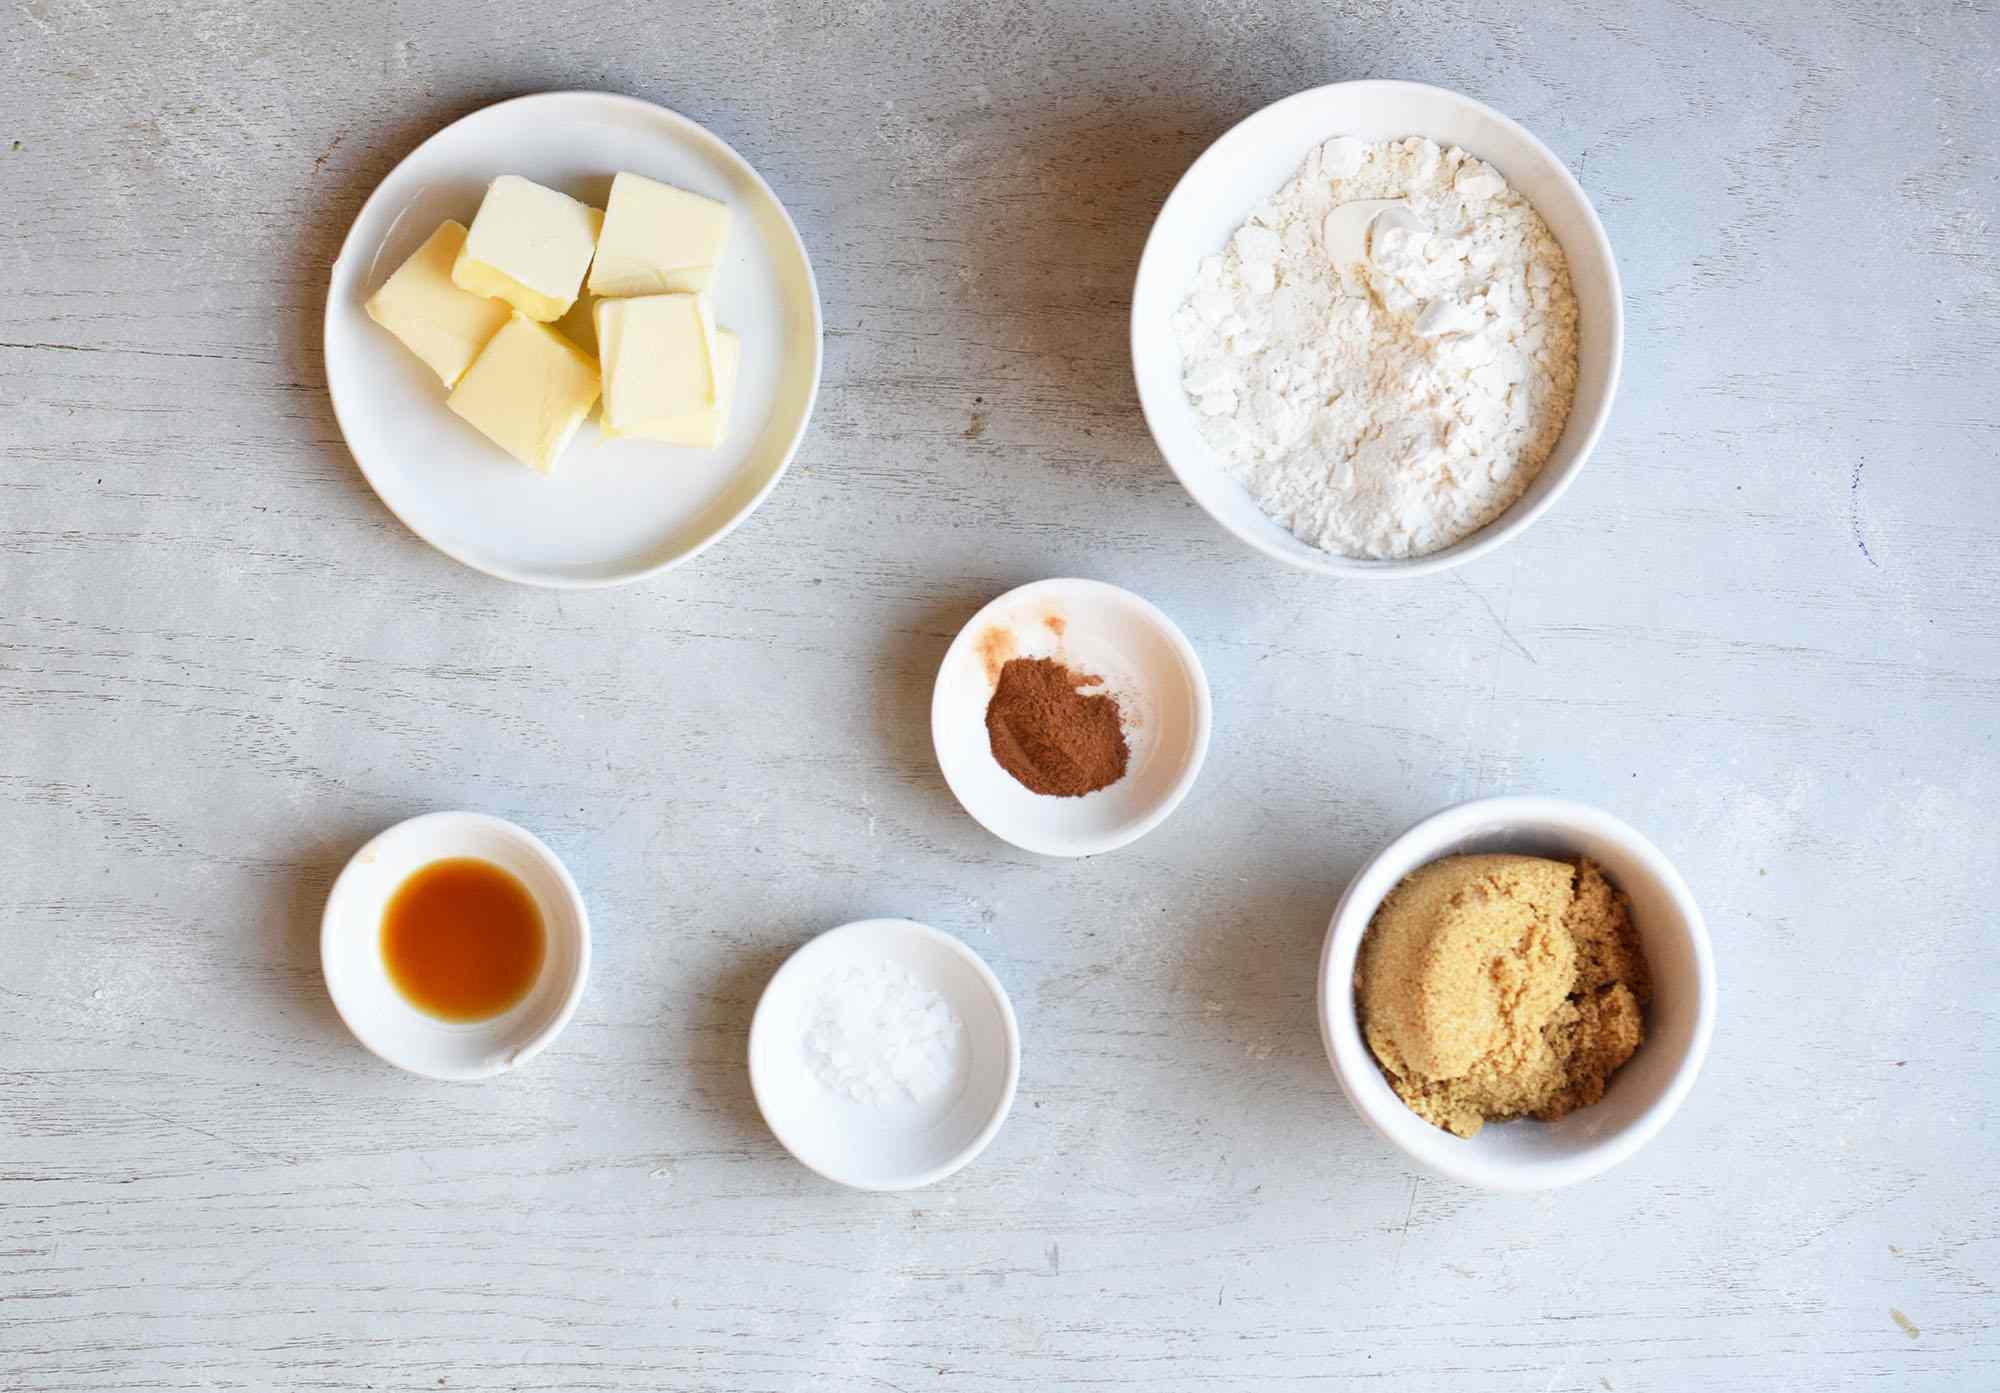 streusel ingredients for apple streusel recipe